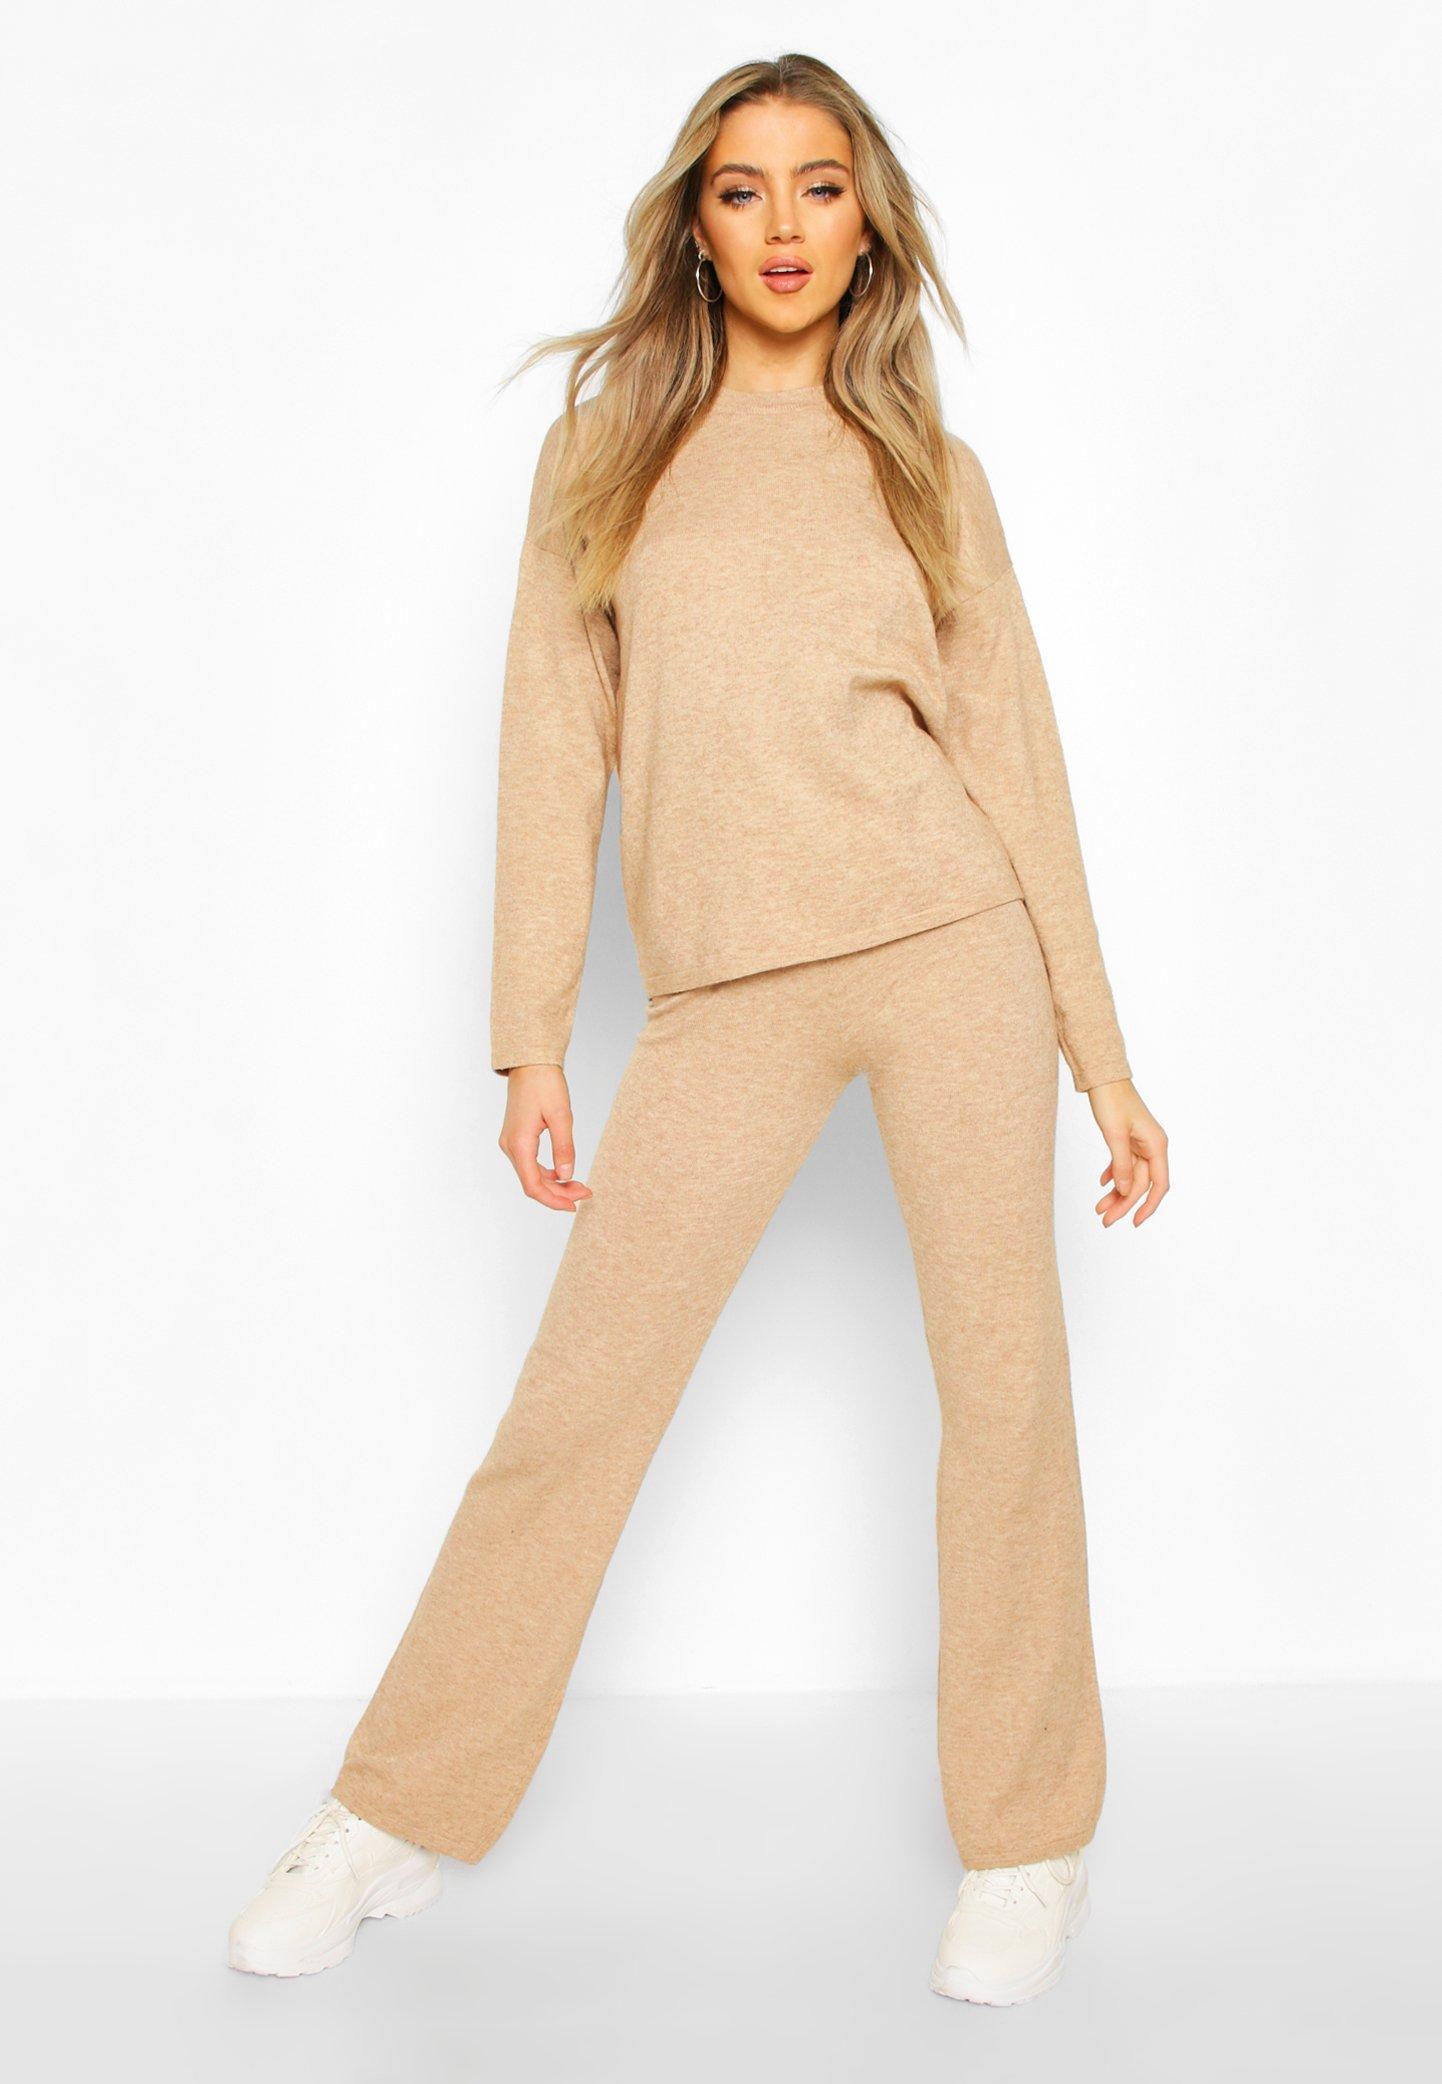 Купить со скидкой Soft Yarn Blend Jumper & Trouser Set